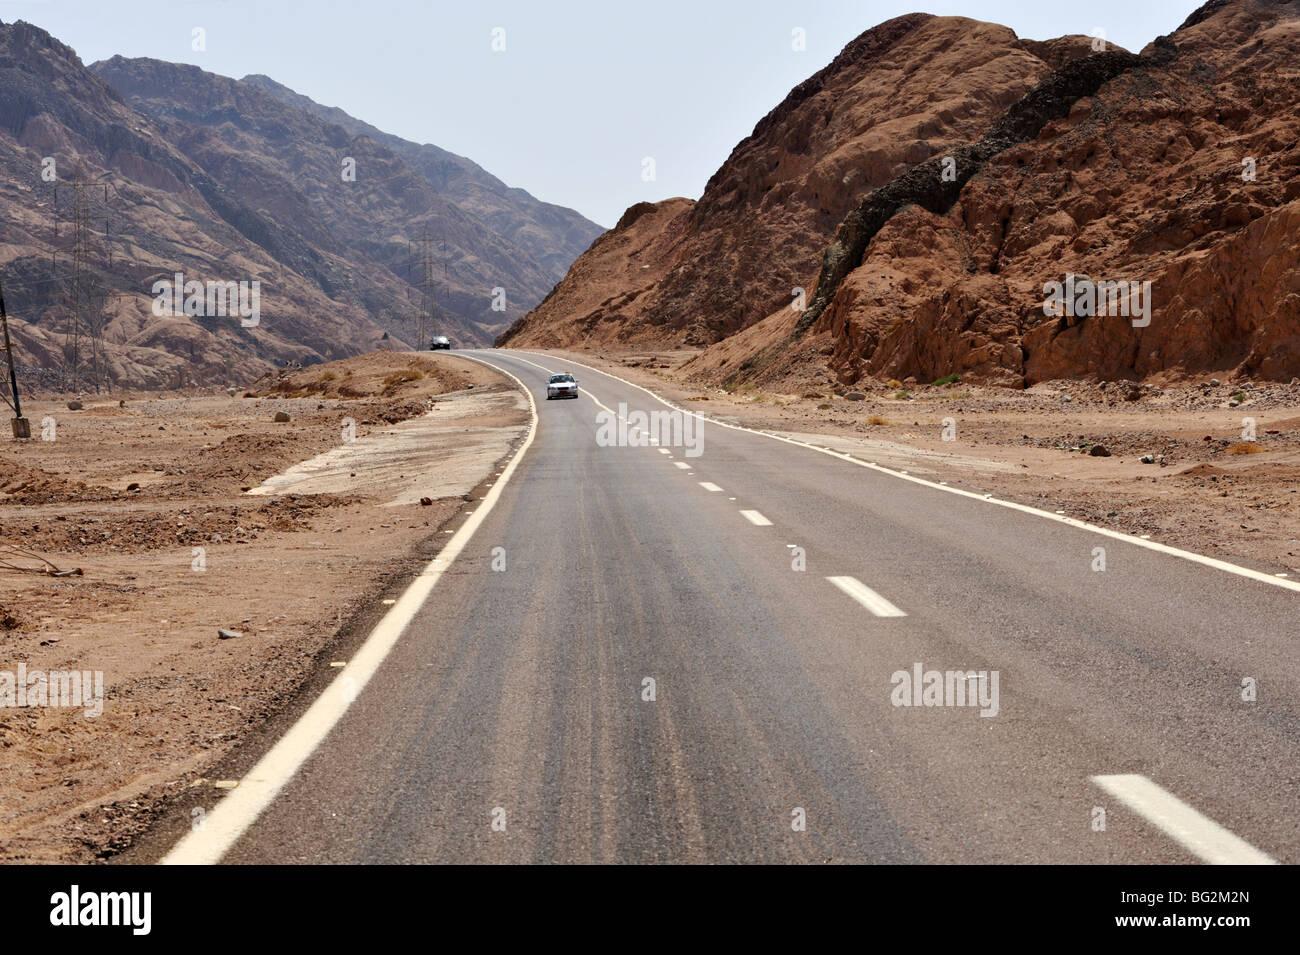 Road between Dahab and Nuweiba, Sinai Peninsula, Egypt - Stock Image